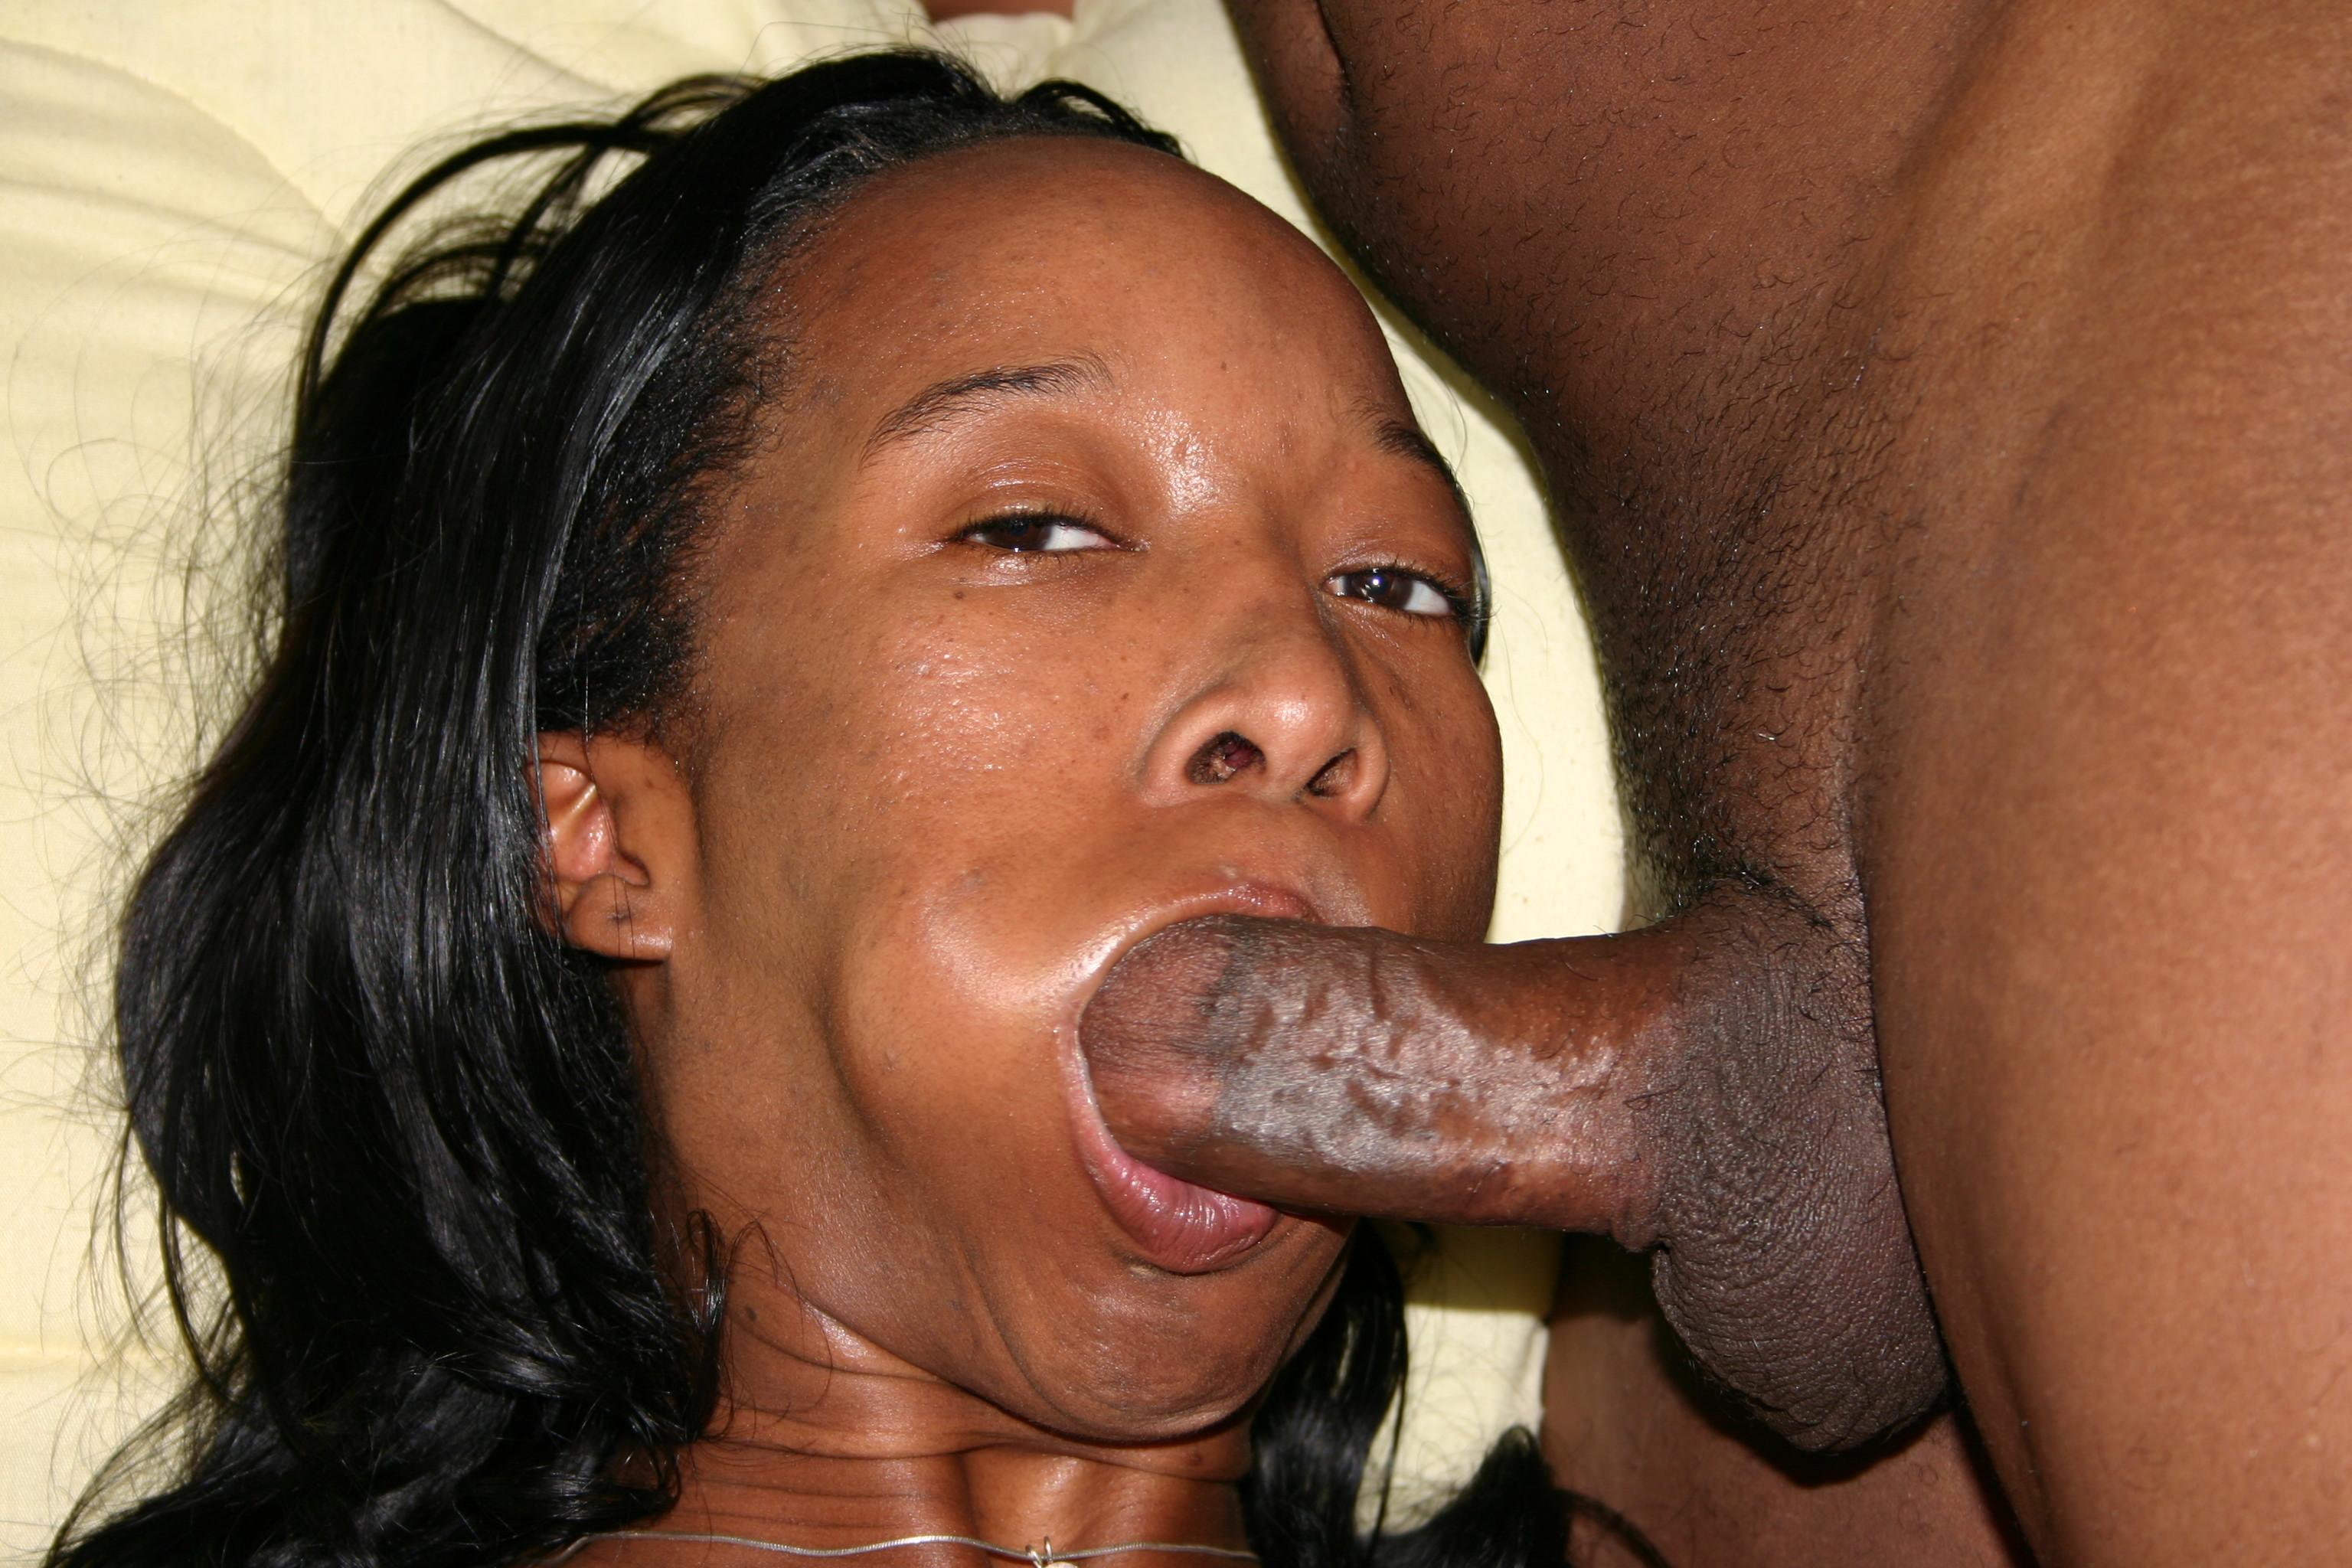 Ebony Blacky steht auf Blowjobs